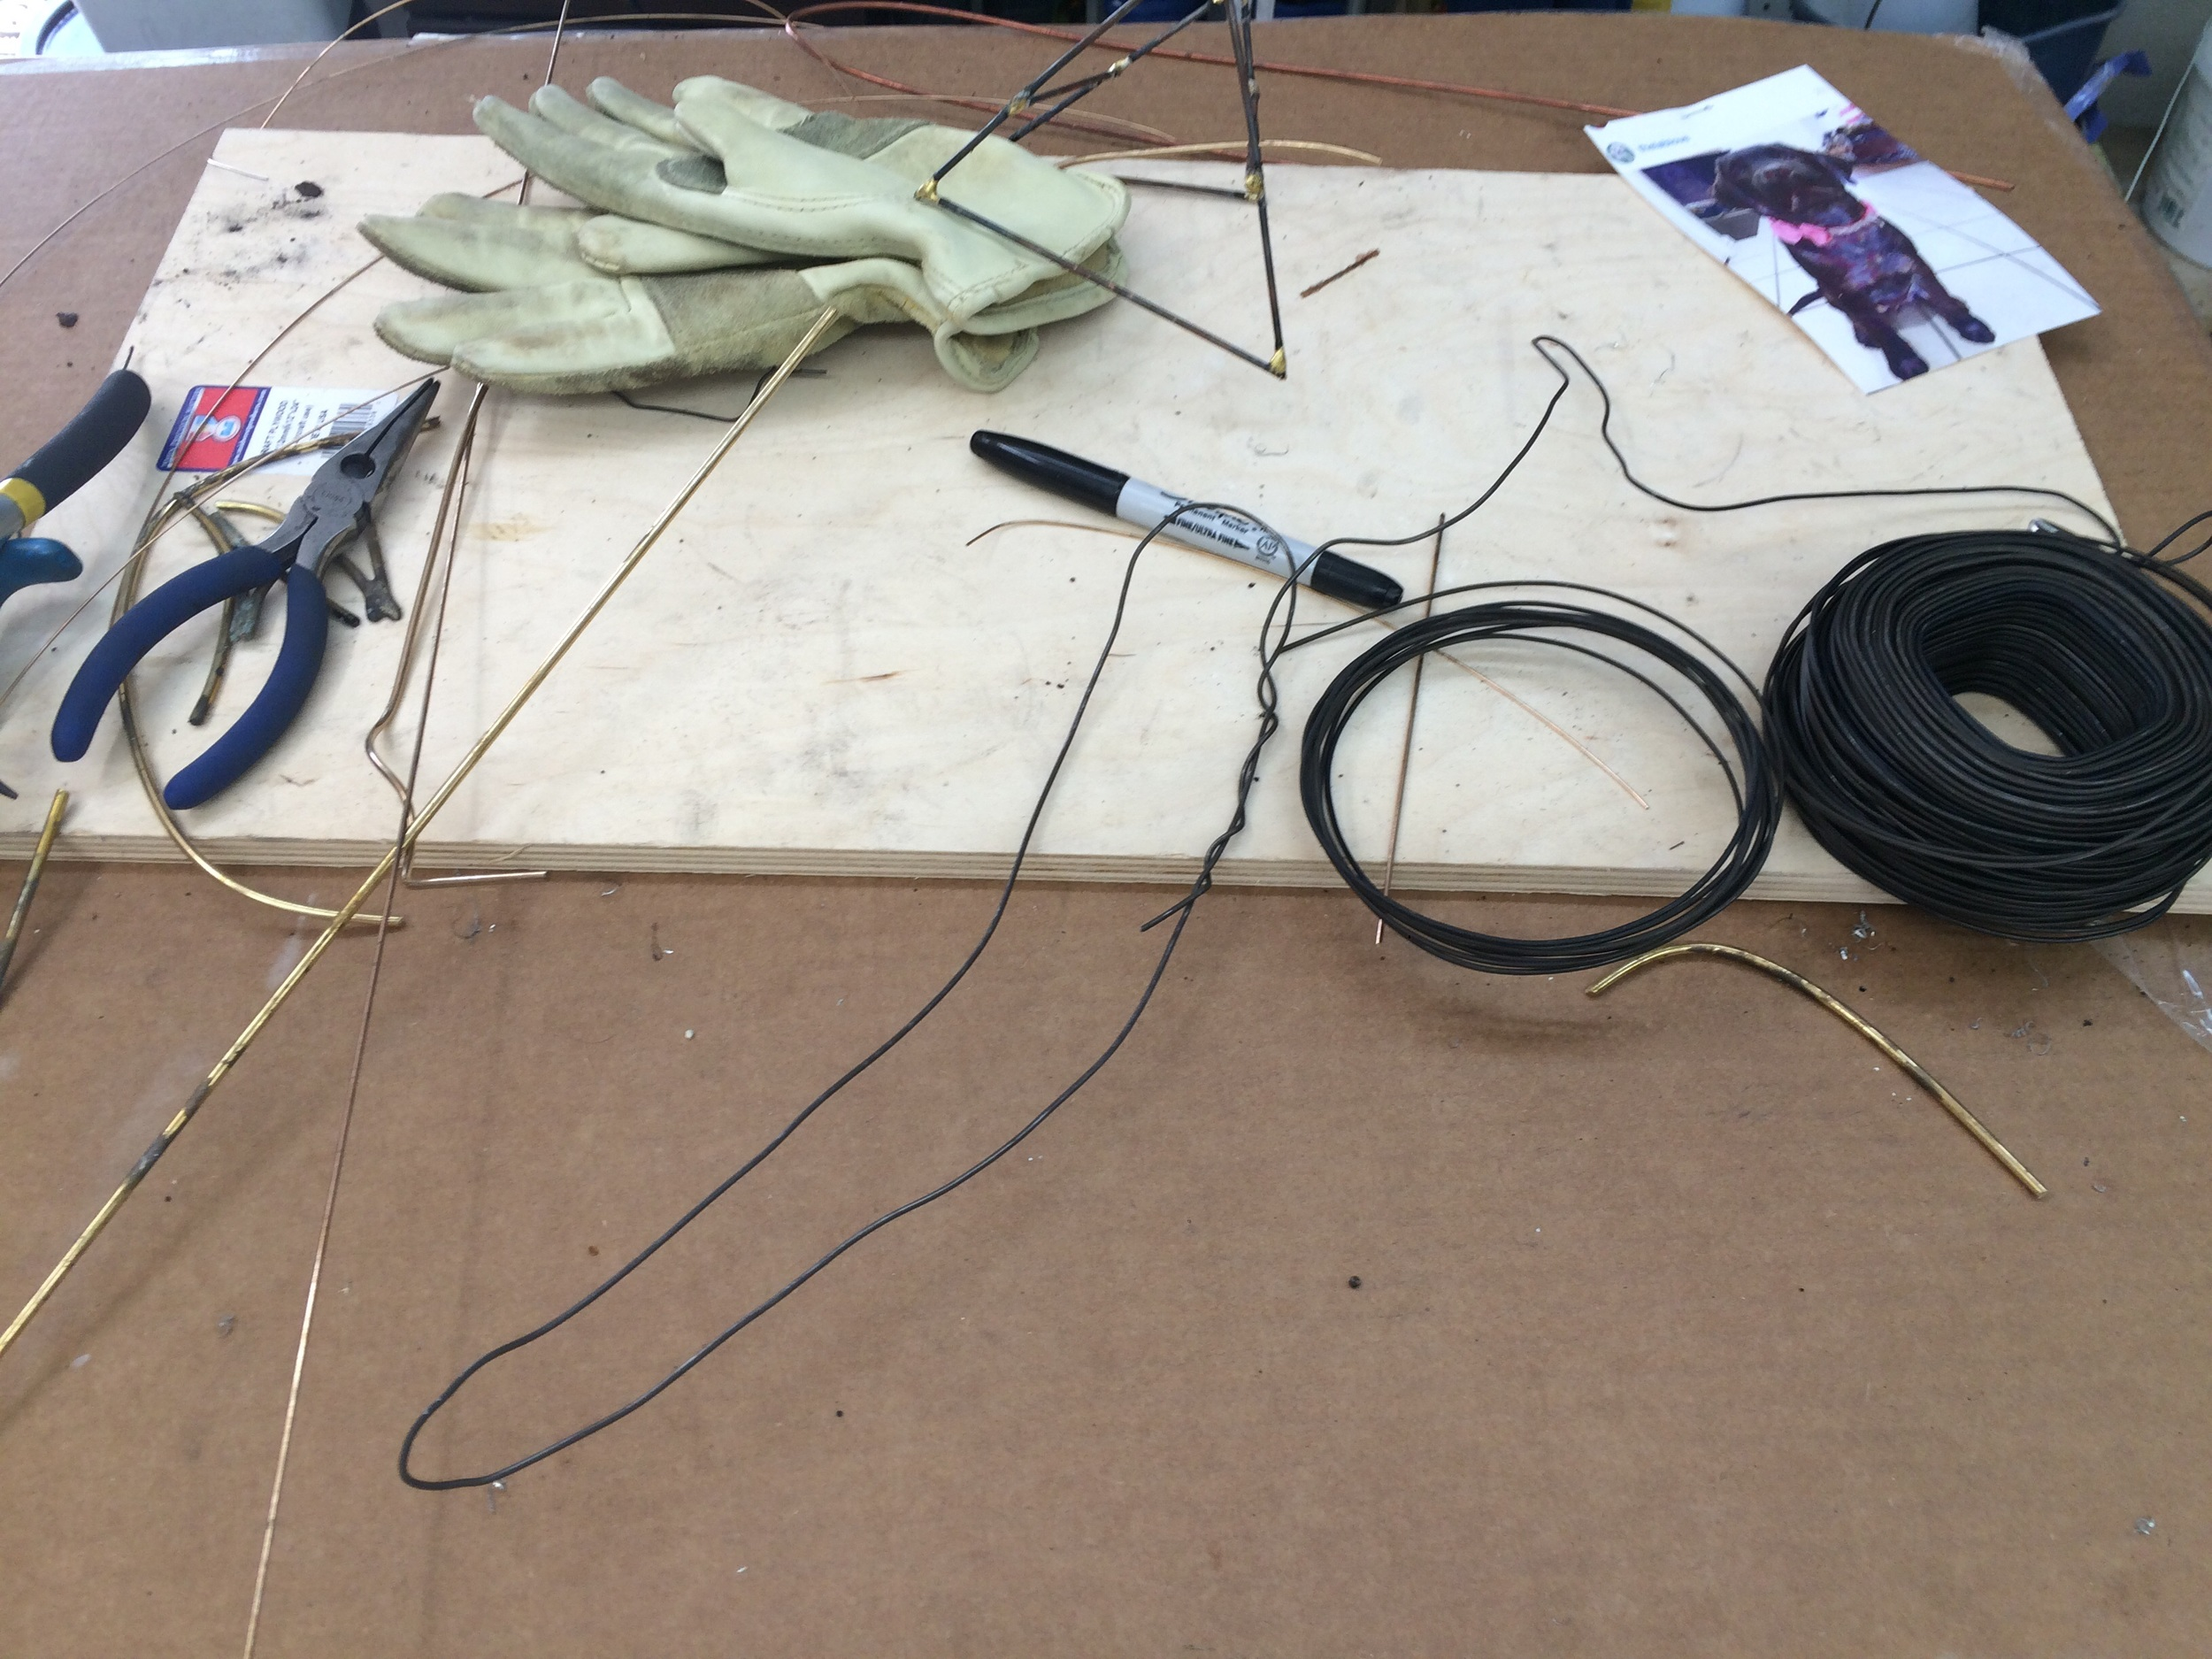 Wire ready to go